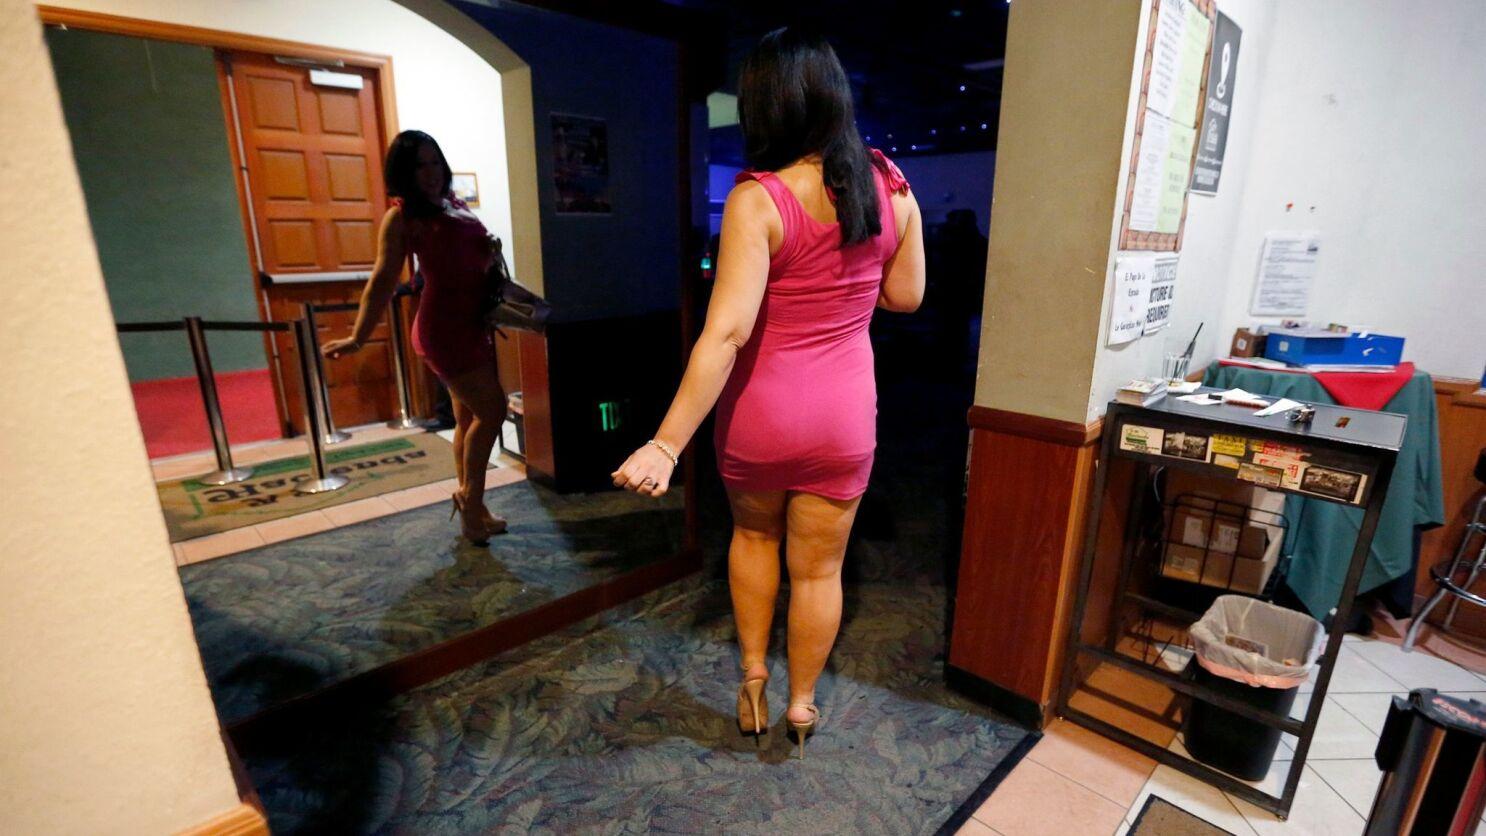 Mature sexy black ebony women in tight dress Going Out Dresses Curvy Sense